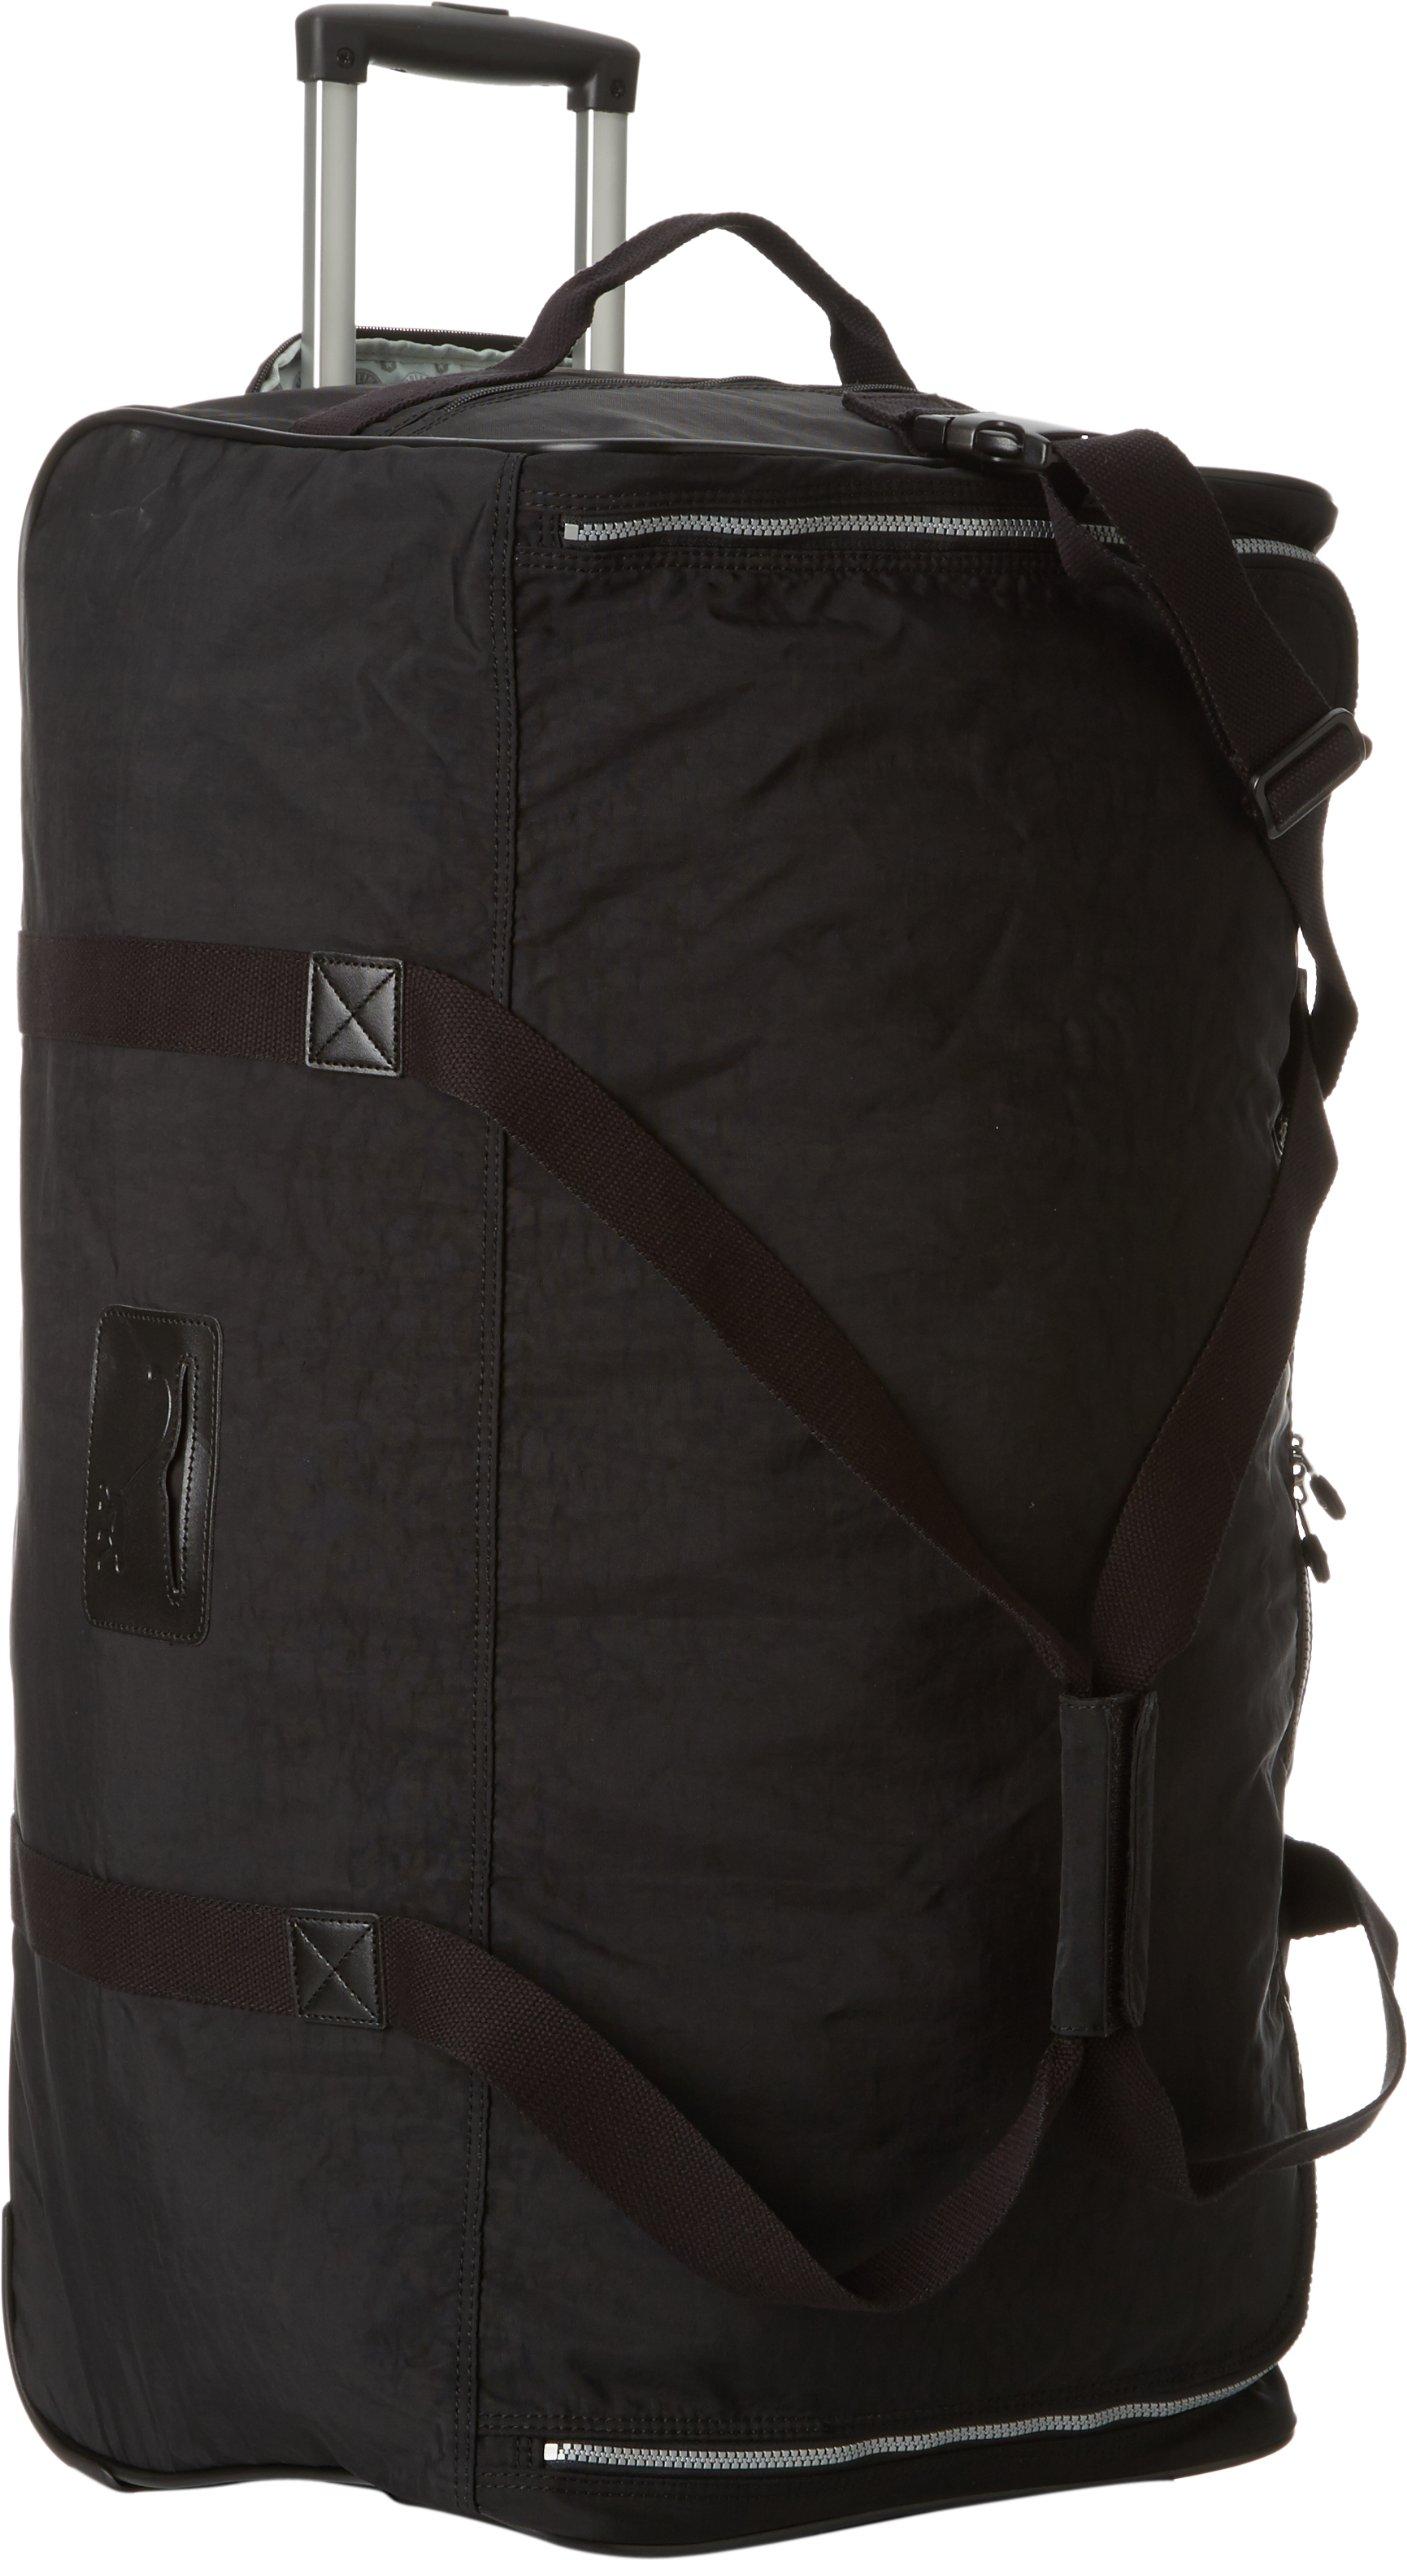 Kipling Darcey Solid Large Wheeled Luggage , Black, One Size